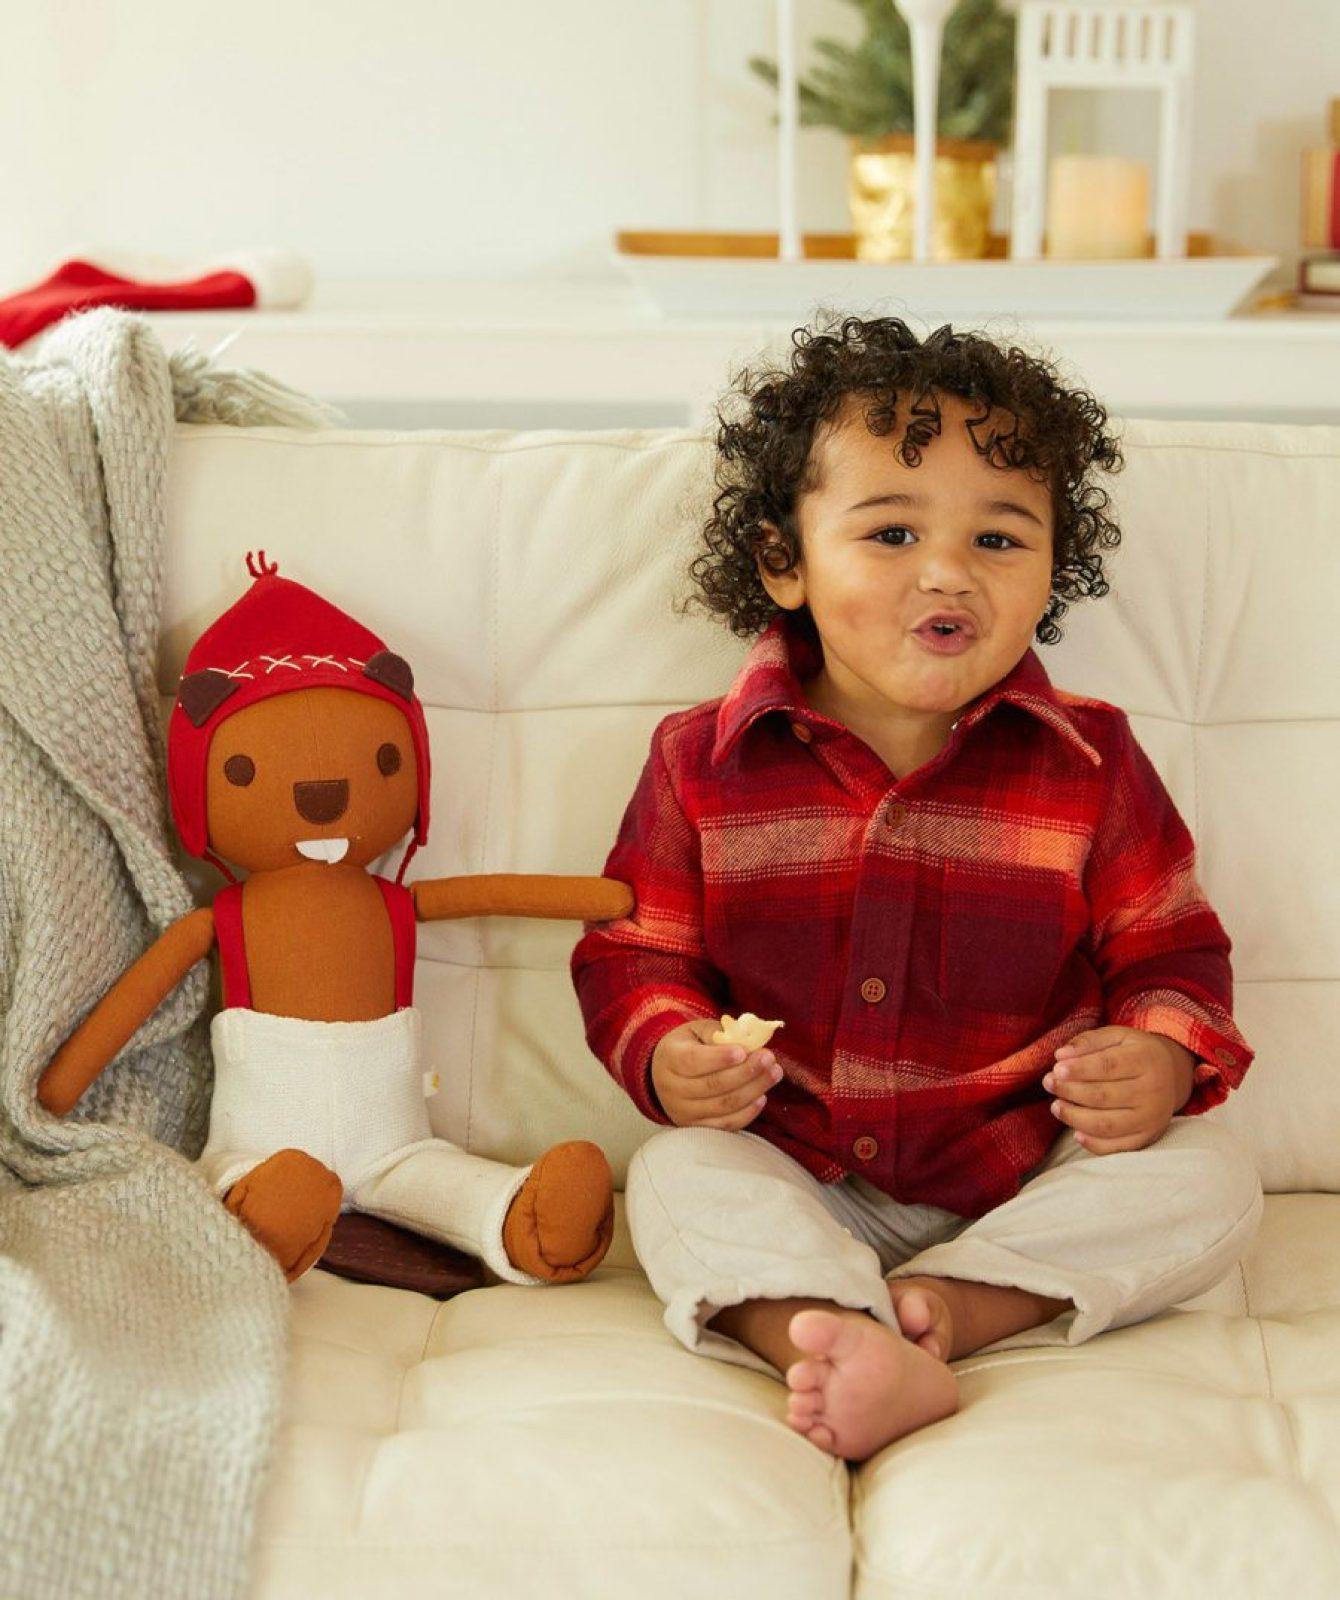 plaid-shirt Baby Christmas Outfits We Adore